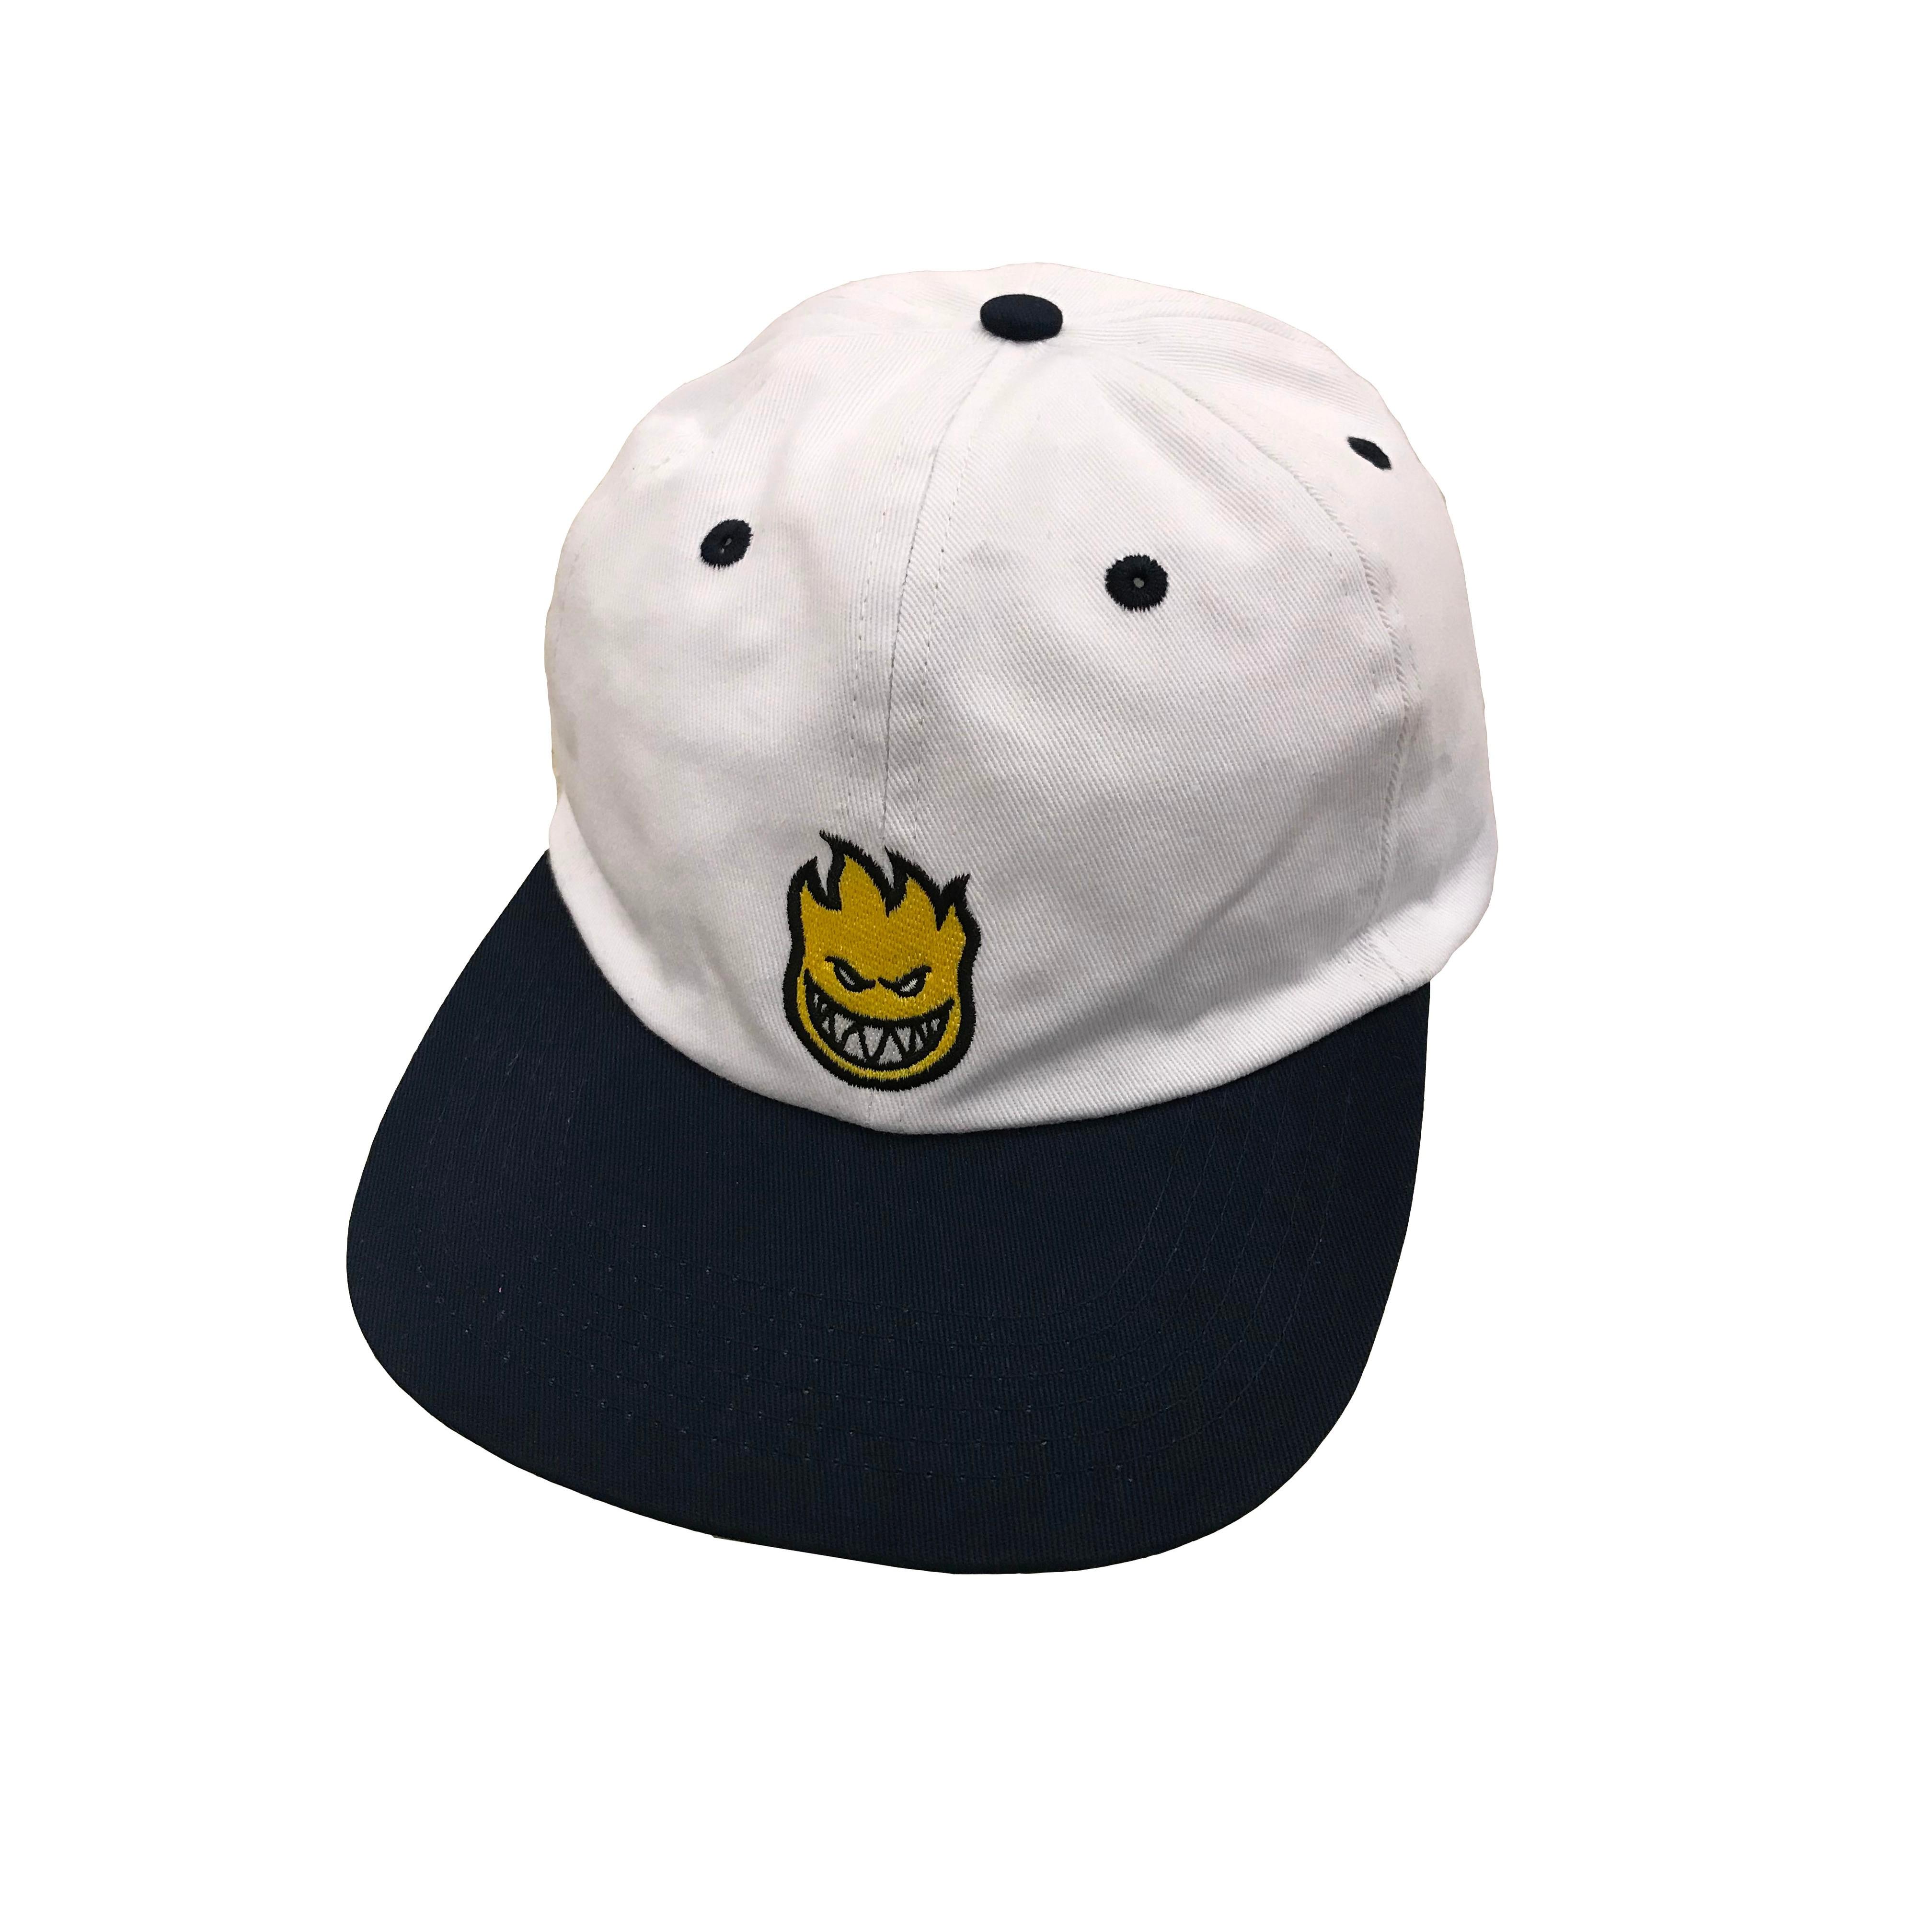 Bighead Hat (White/Navy Blue)